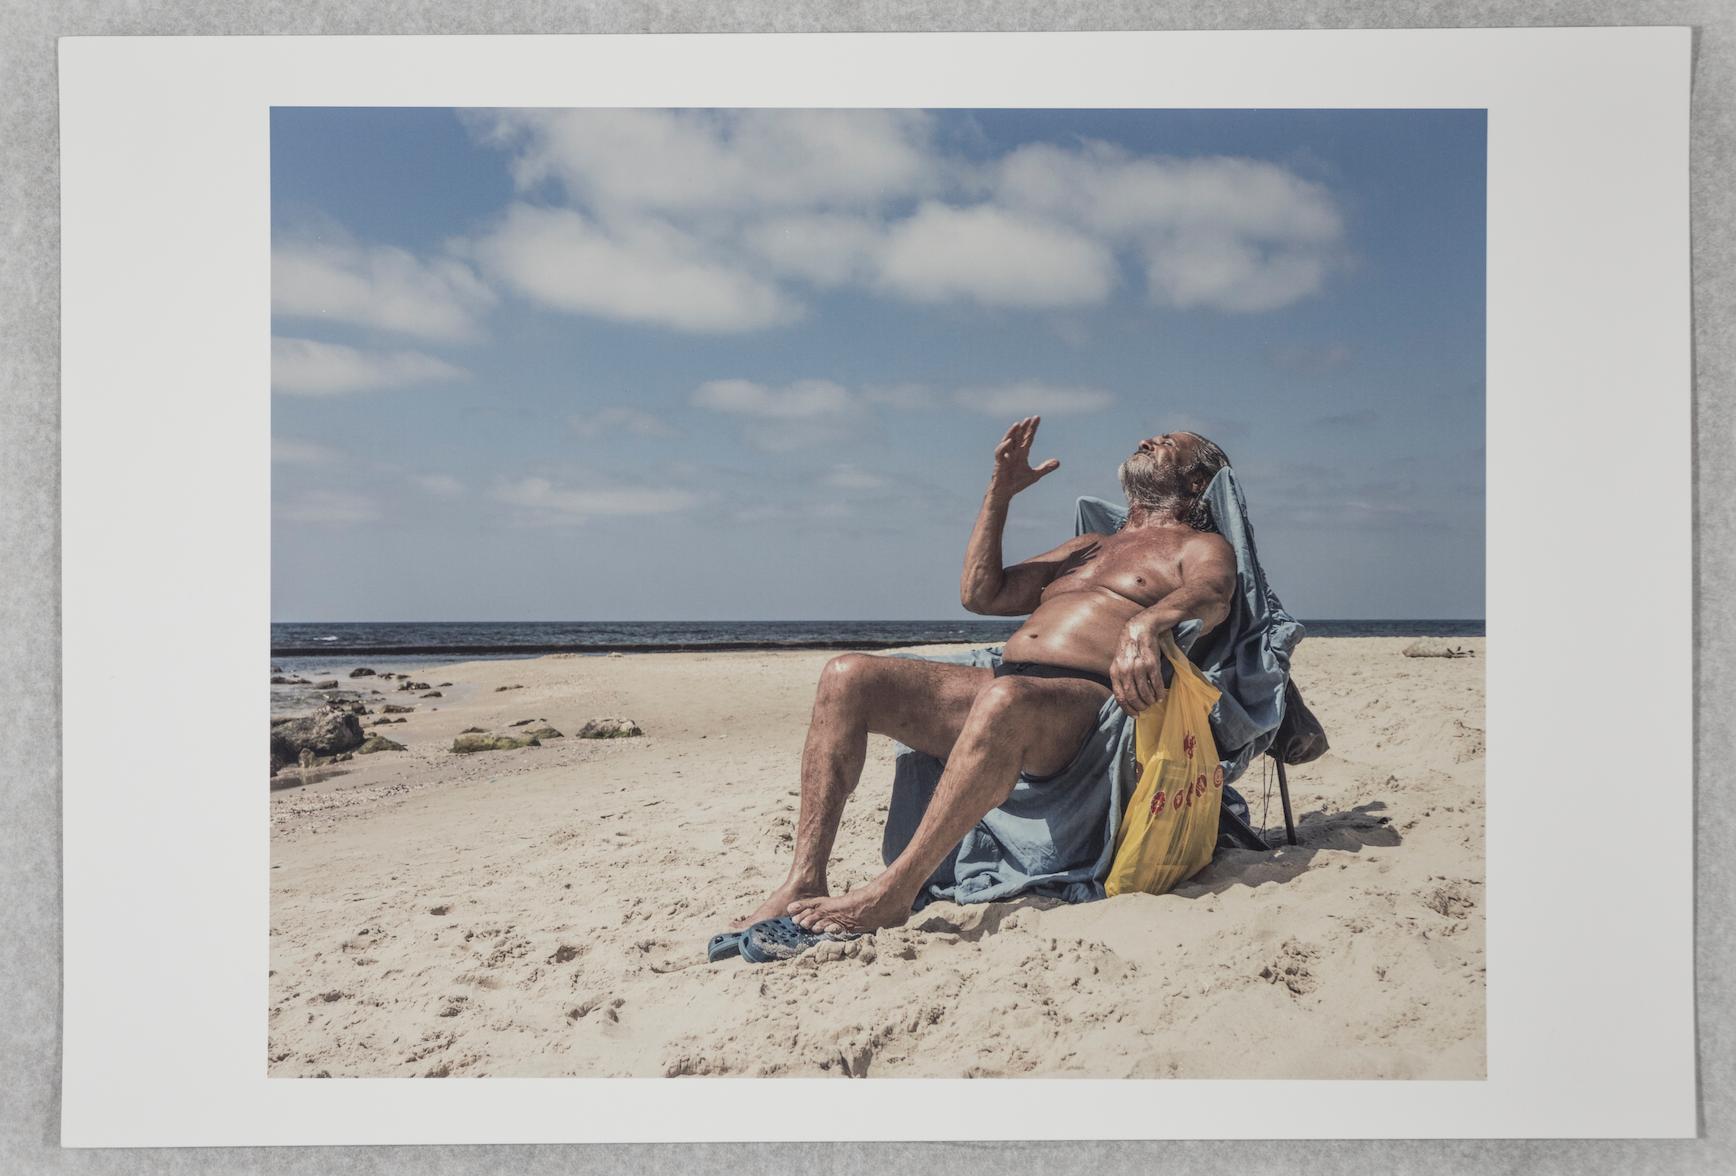 Promise Land Beach JewPop